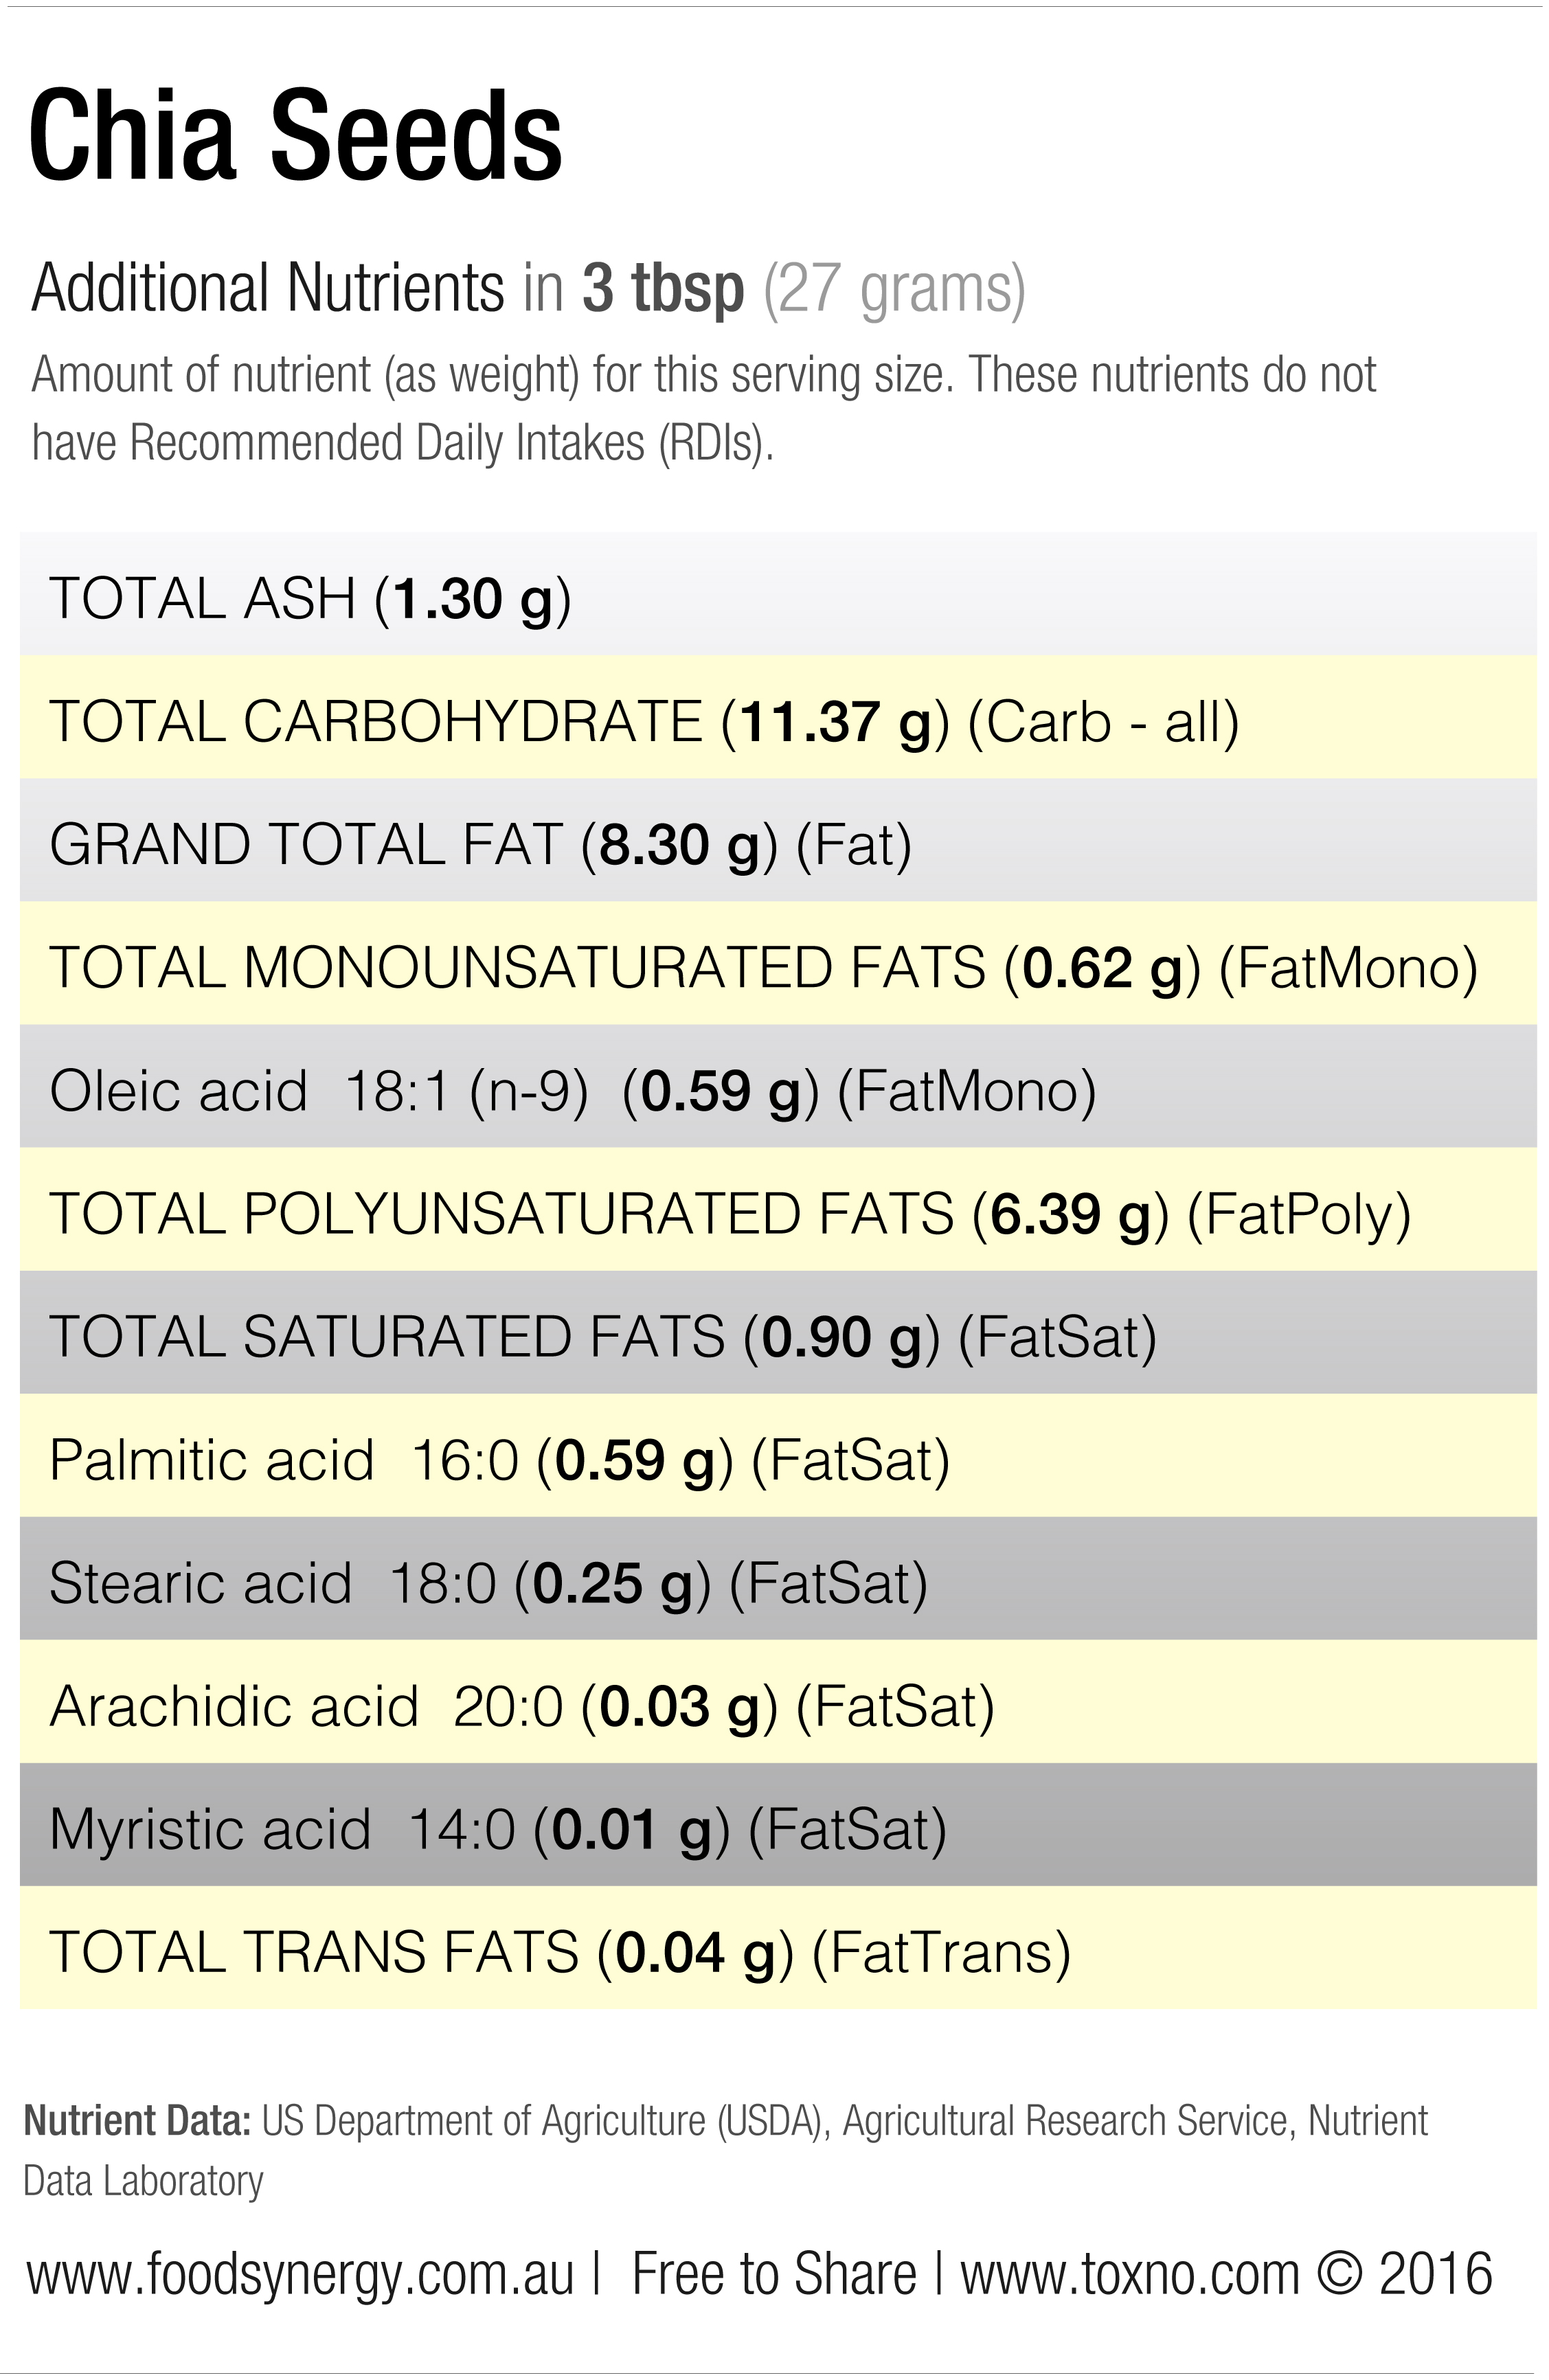 Chia-Seed-Nutrients2